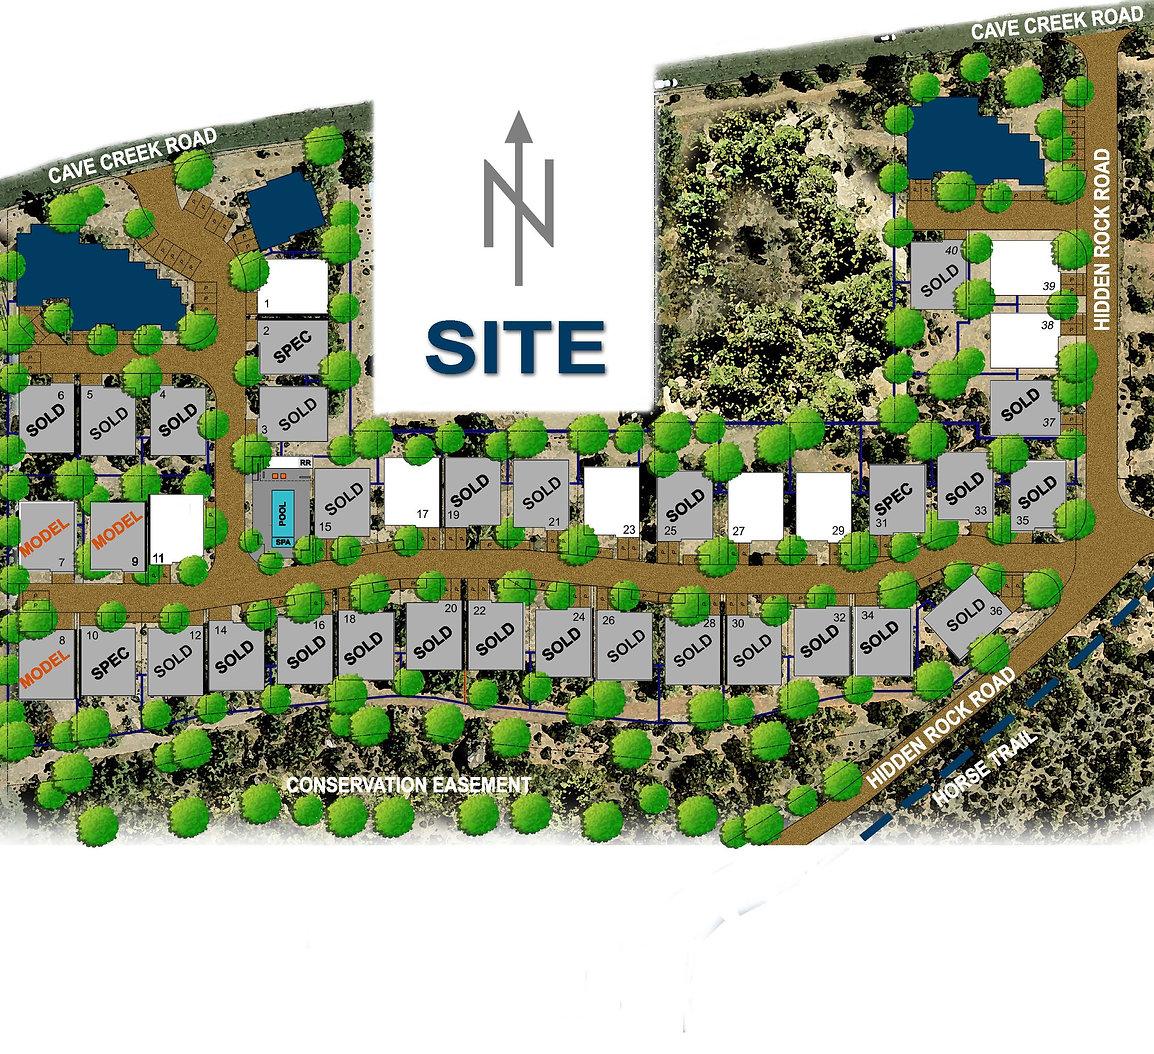 WEBSITE SITE MAP 2262020.jpg